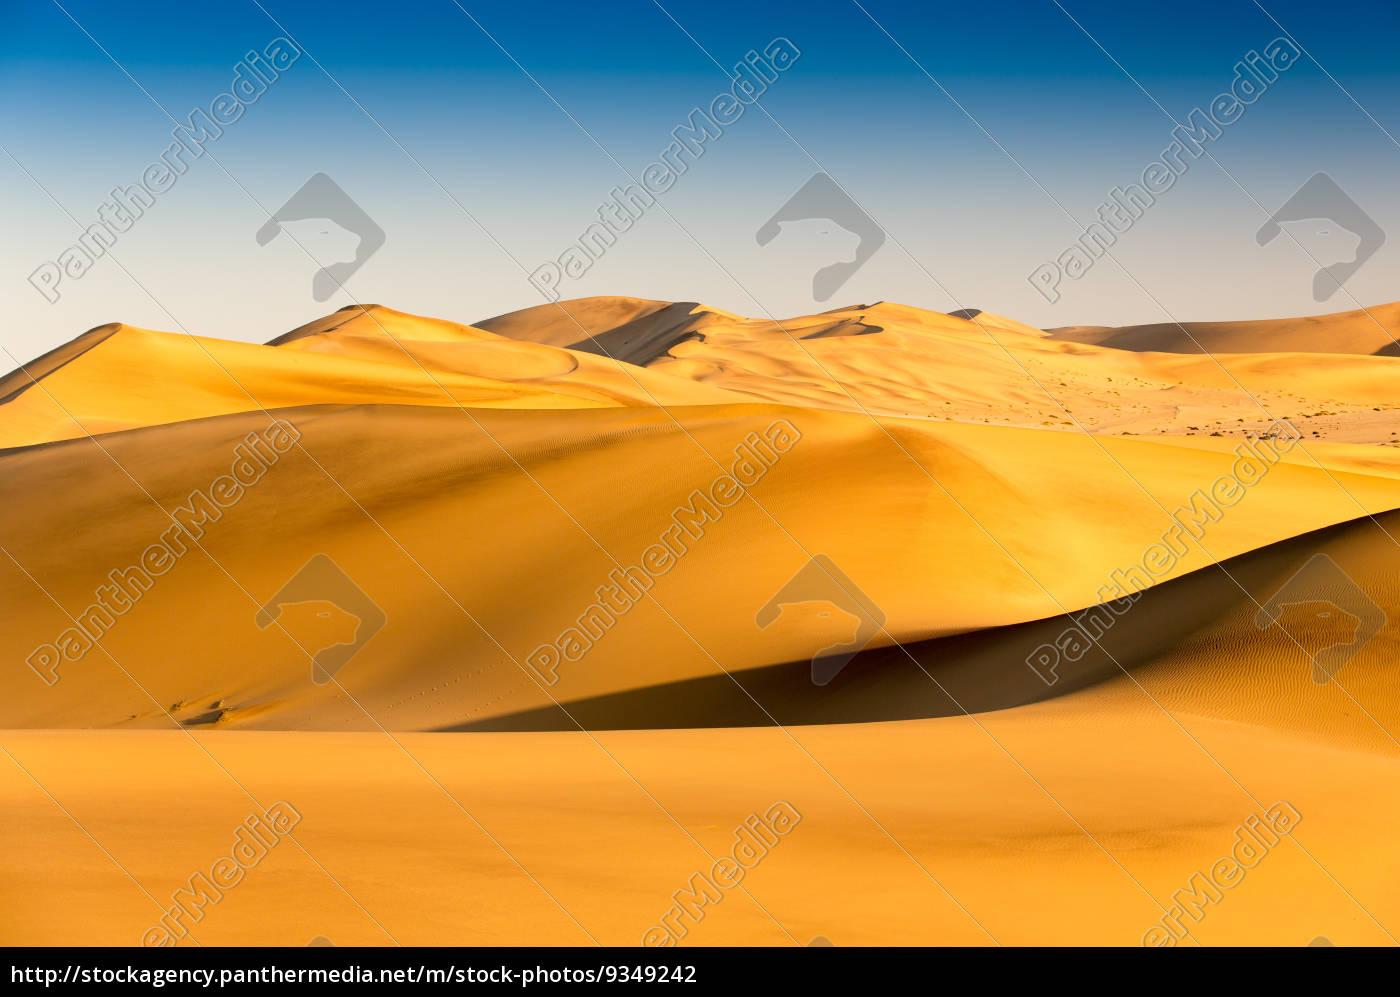 desert, wasteland, africa, namibia, dry, dried up - 9349242